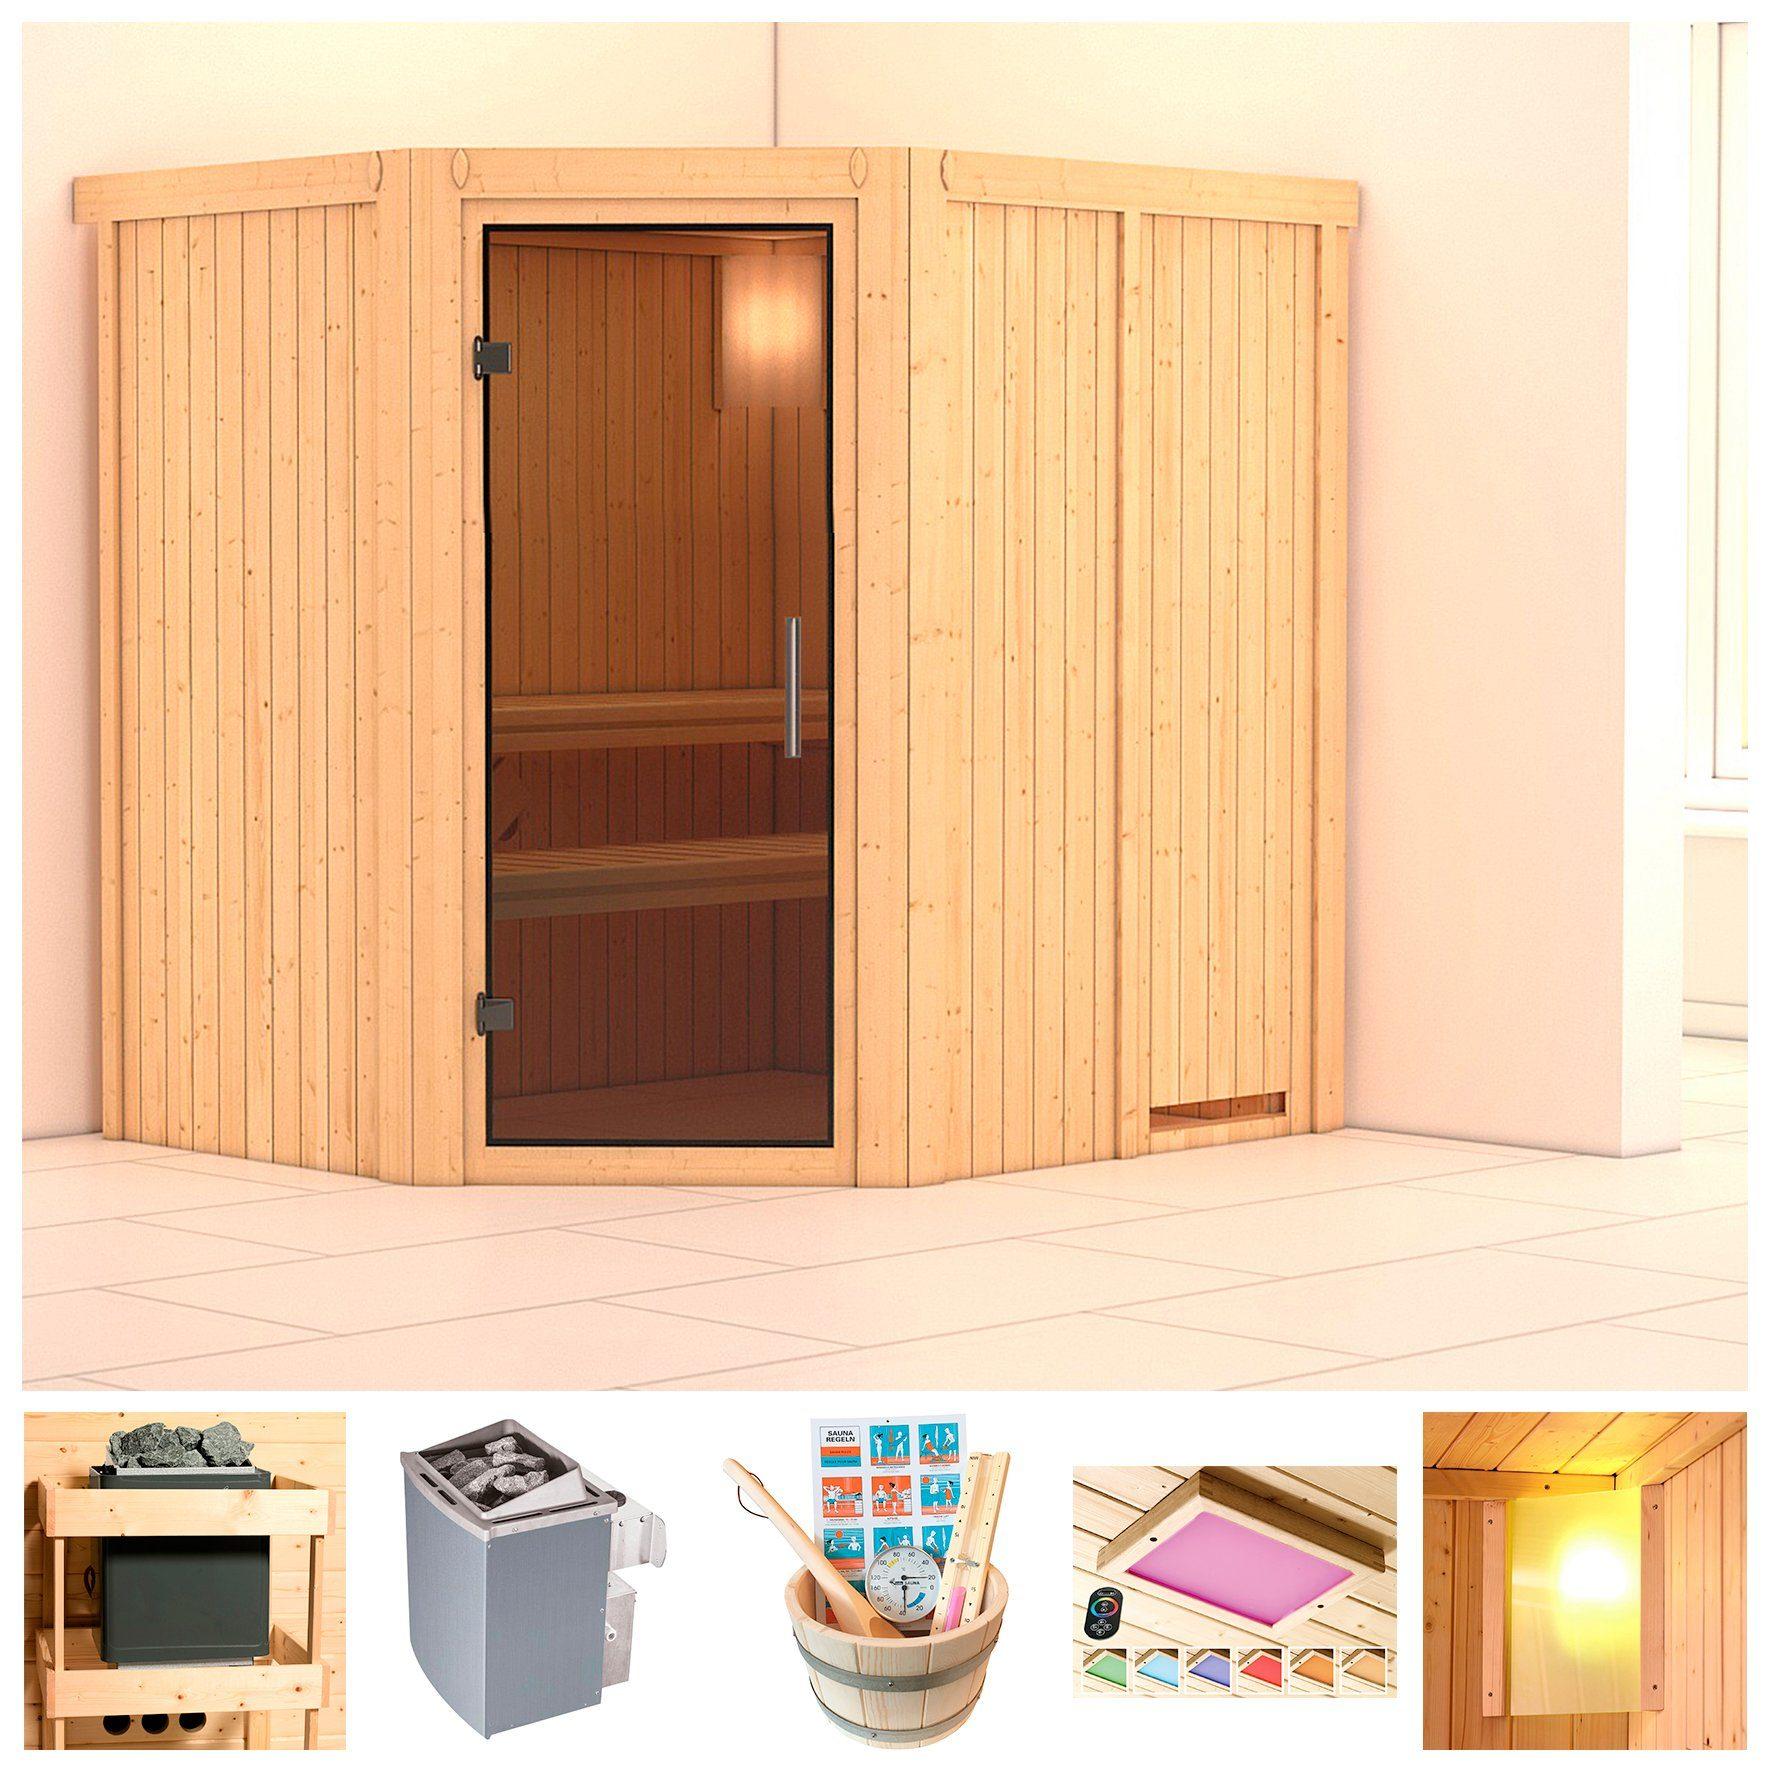 KONIFERA Sauna »Pellworm«, 196x170x198 cm, 9-kW-Ofen mit int. Steuerung